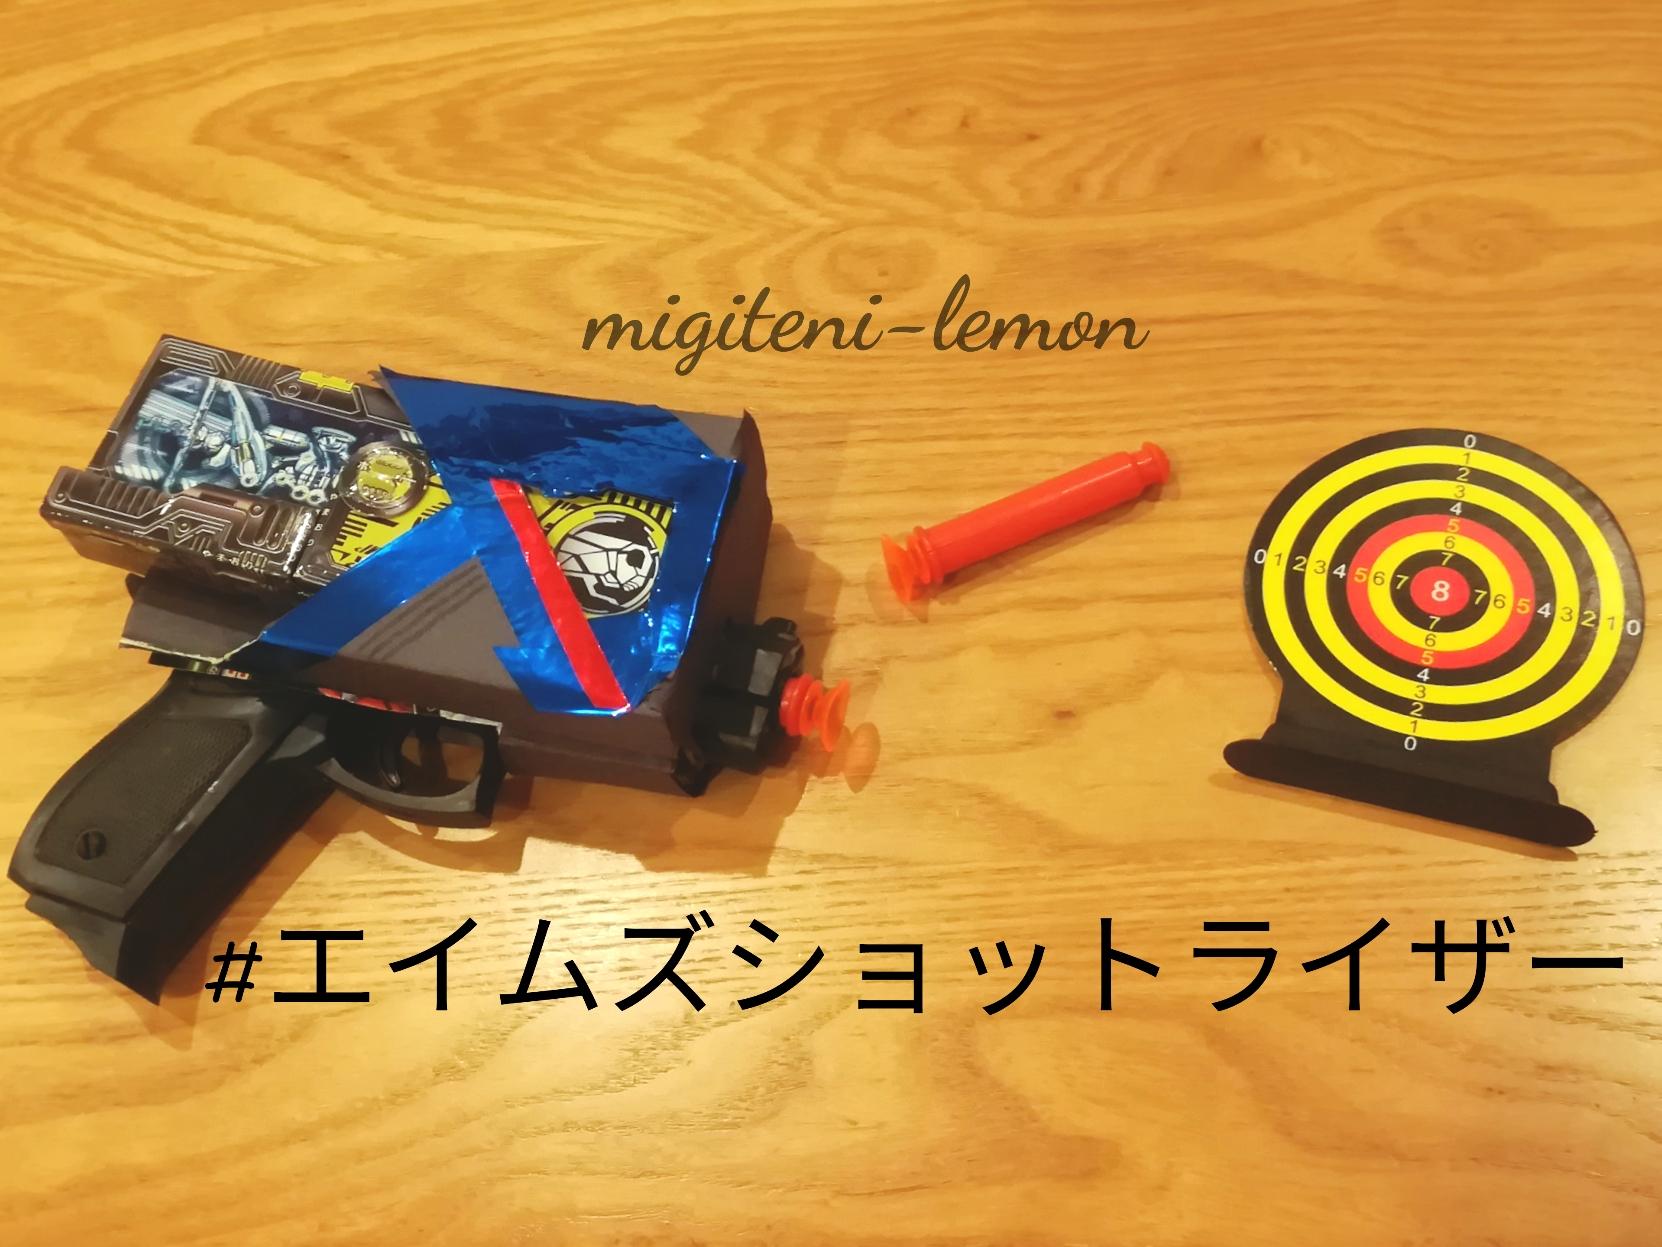 eims-shot-riser-zeroone